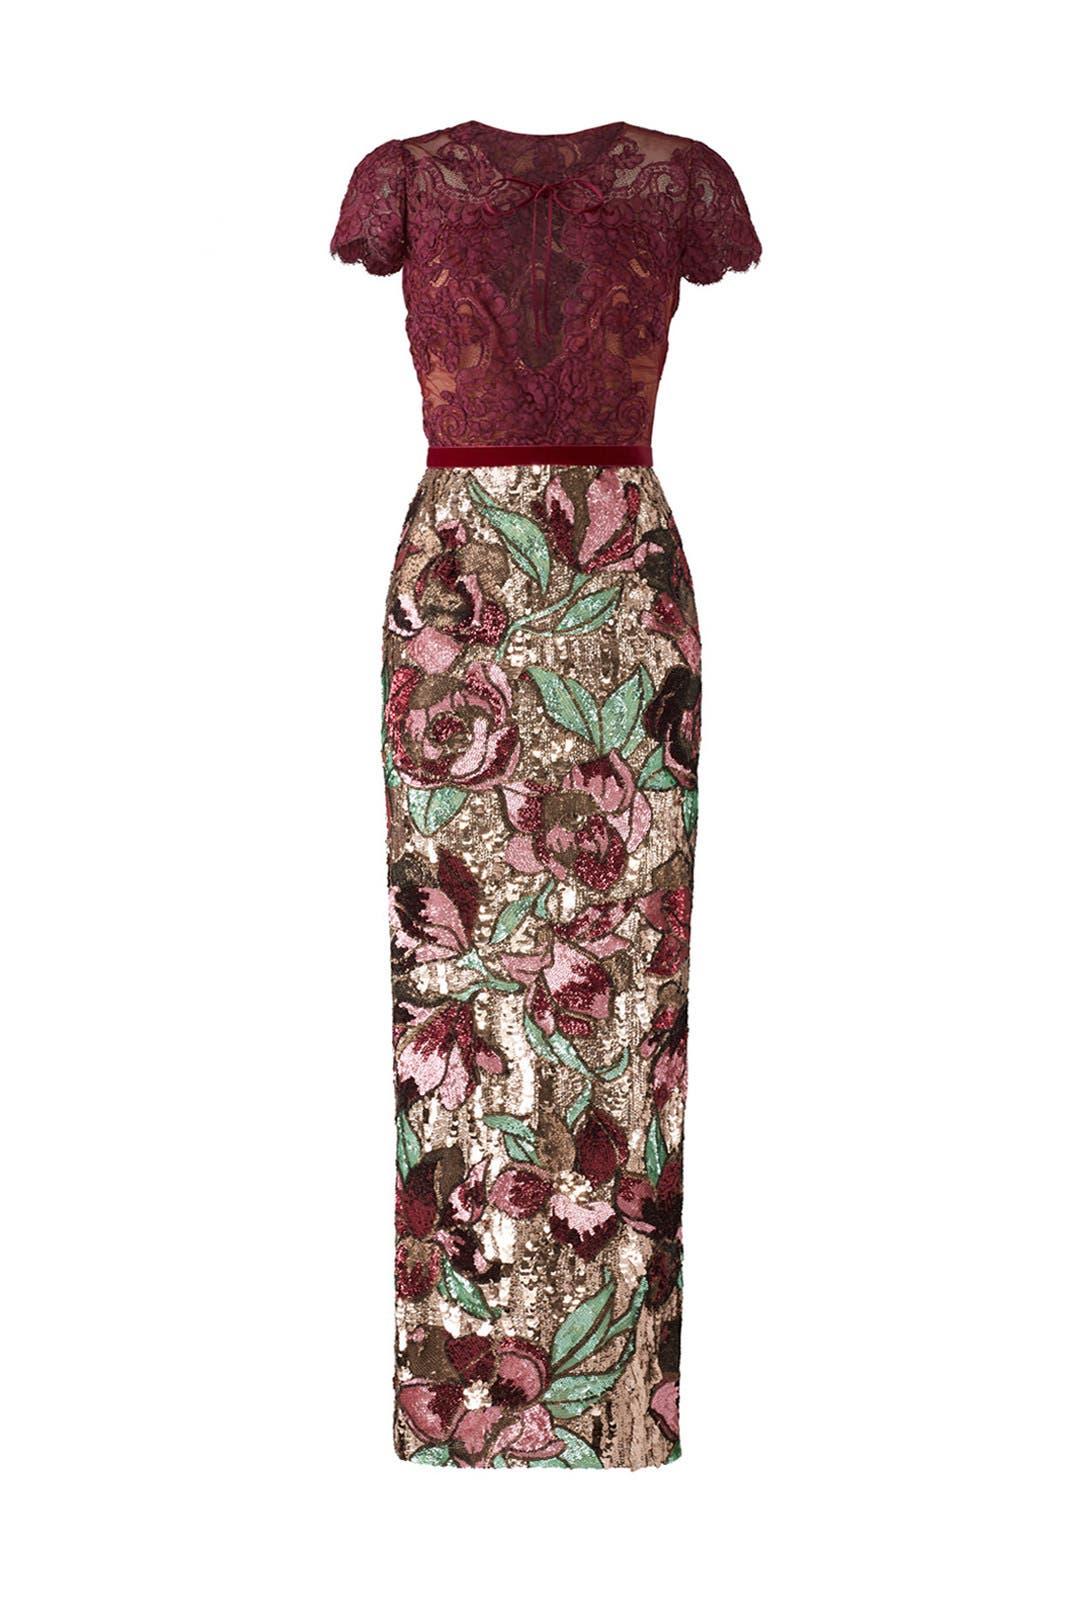 off-the-shoulder sequined dress - Pink & Purple Marchesa 0gyV7ewJhA